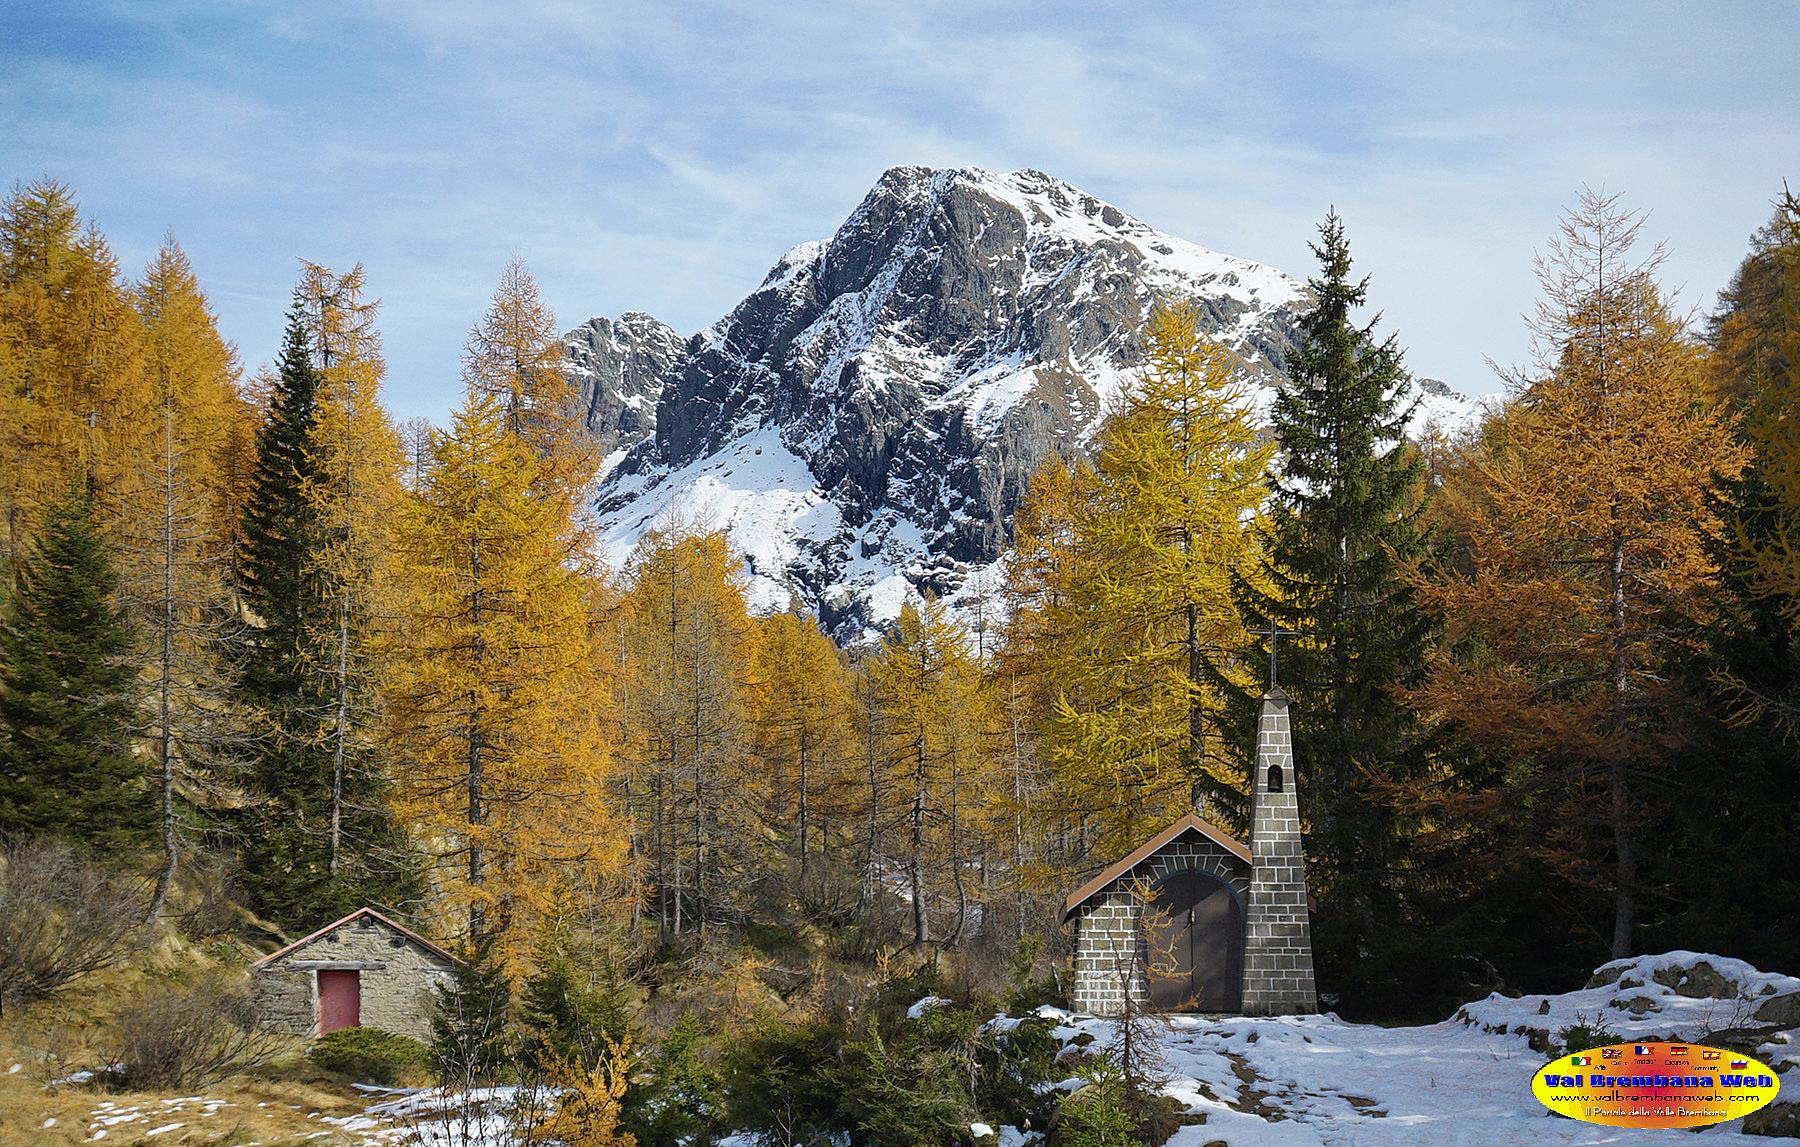 Valle brembana l 39 autunno in armentarga conca calvi for Immagini autunno hd